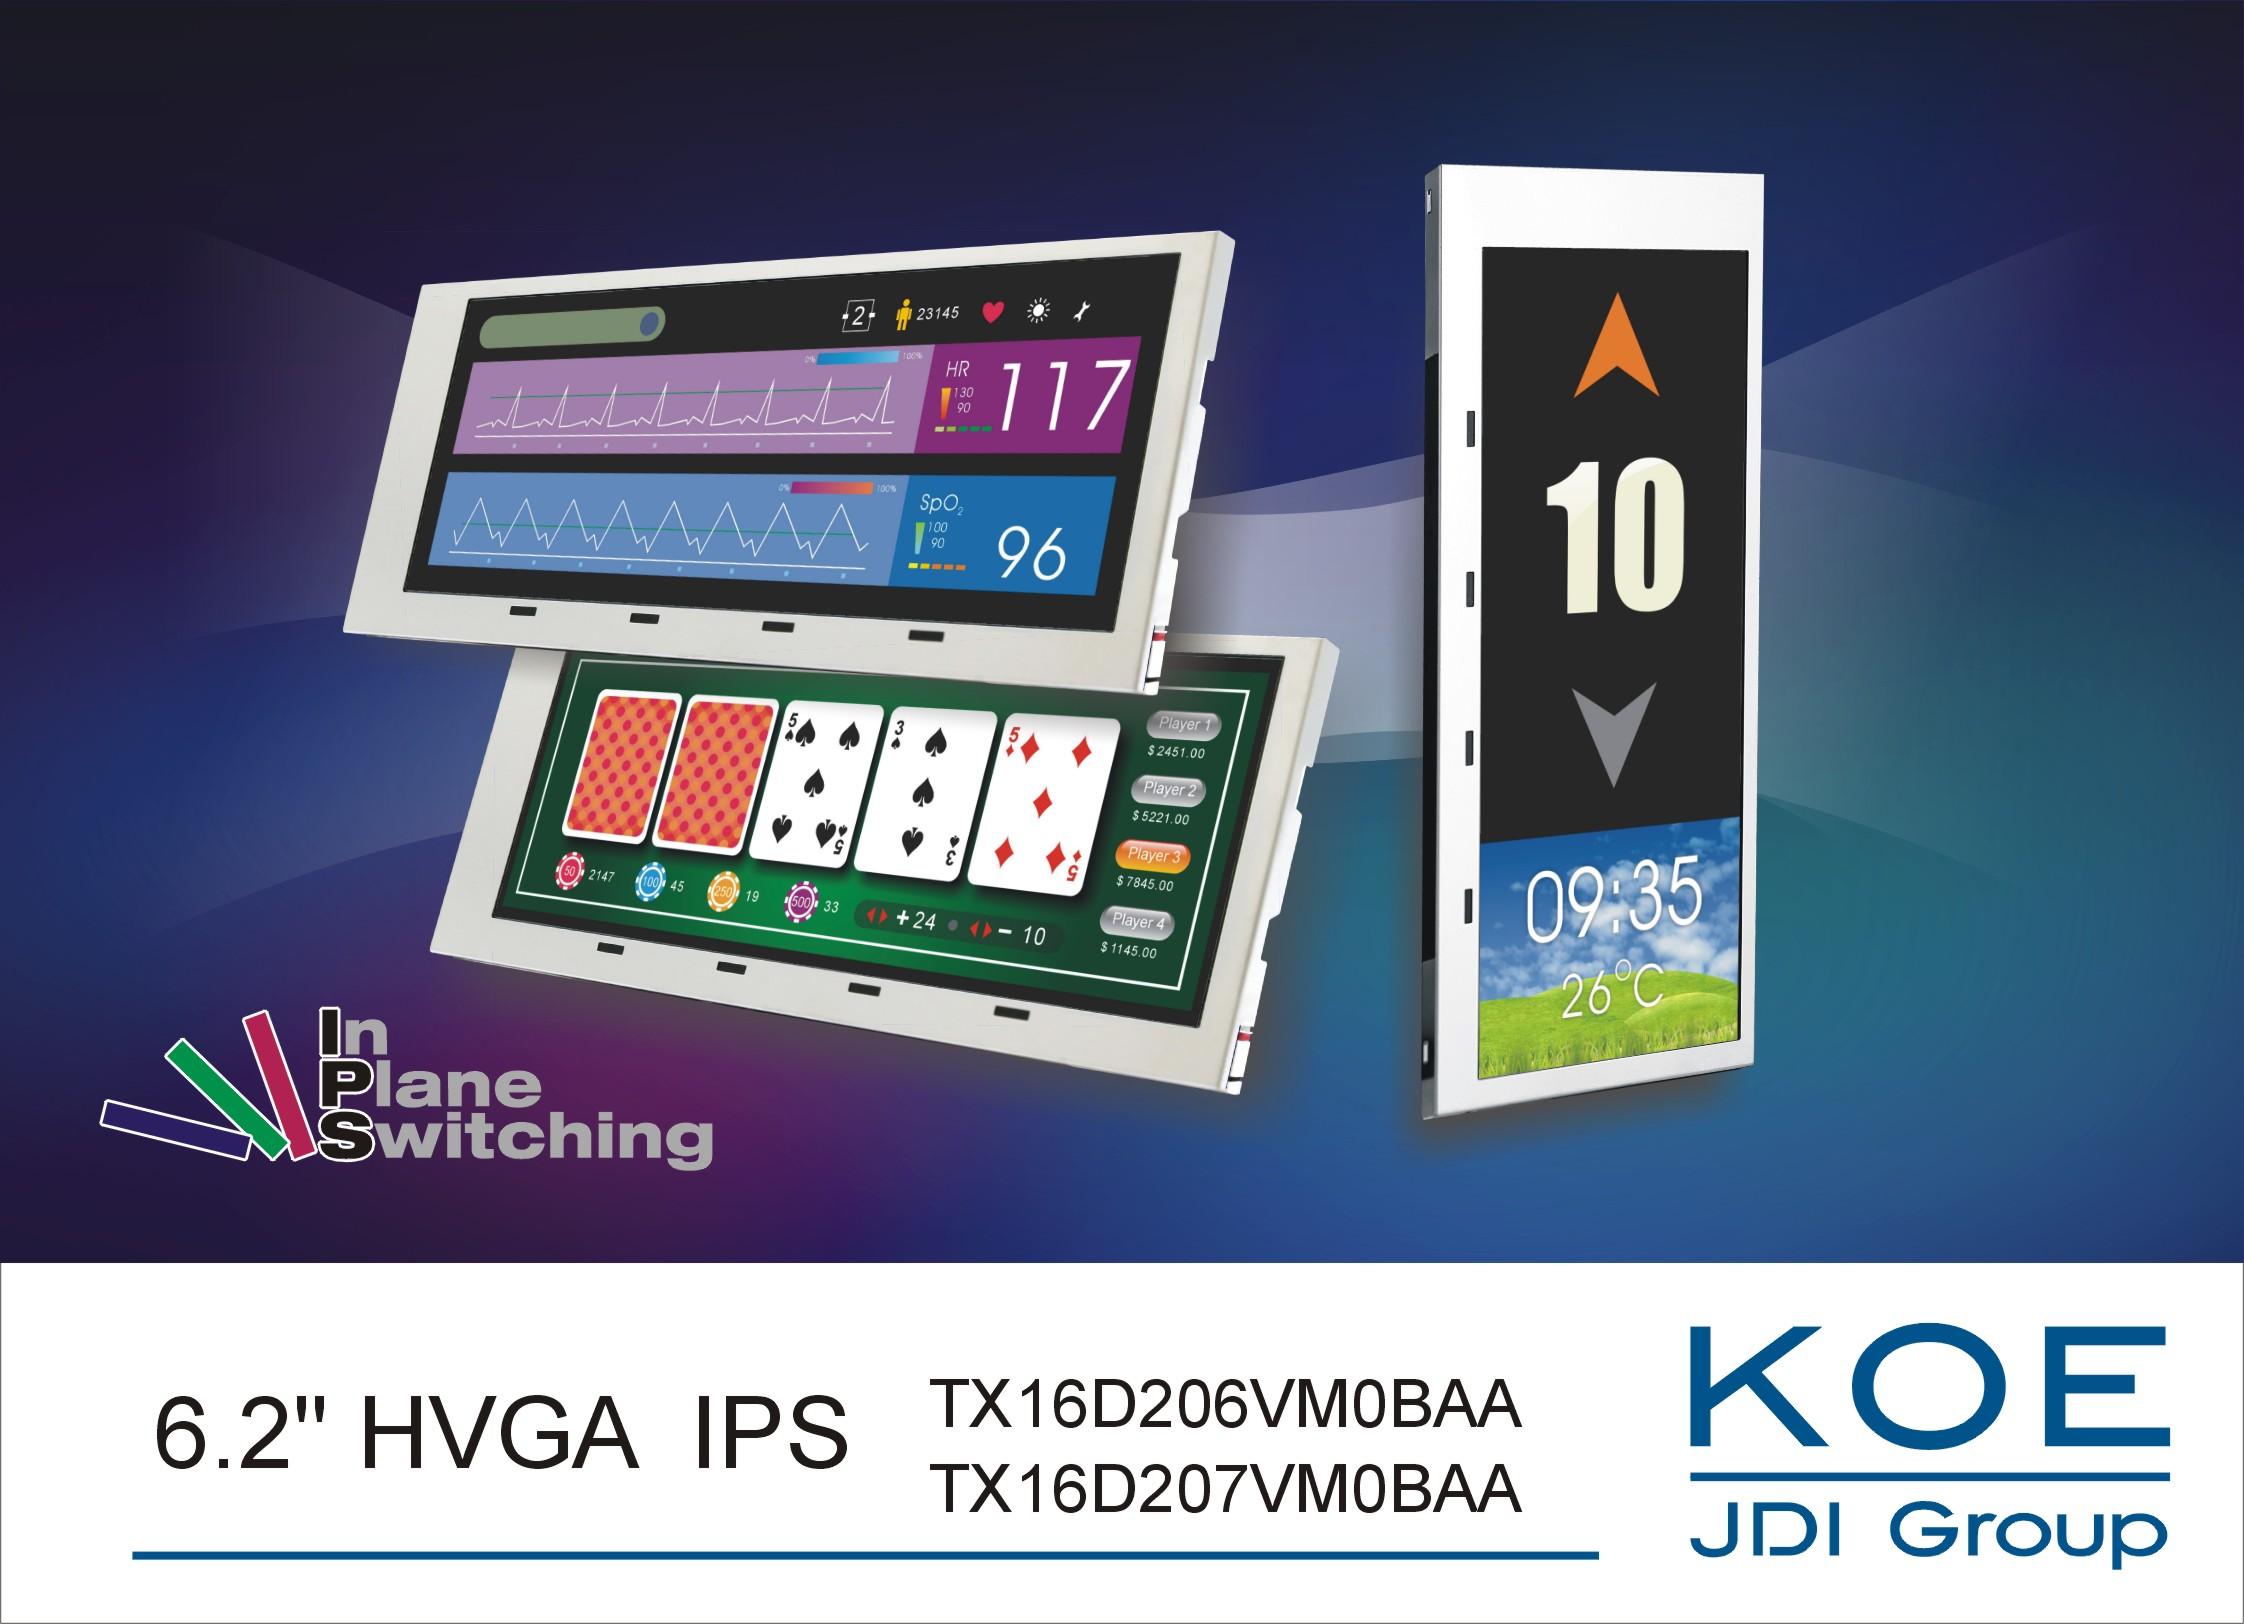 Wide aspect ratio display delivers excellent colour performance